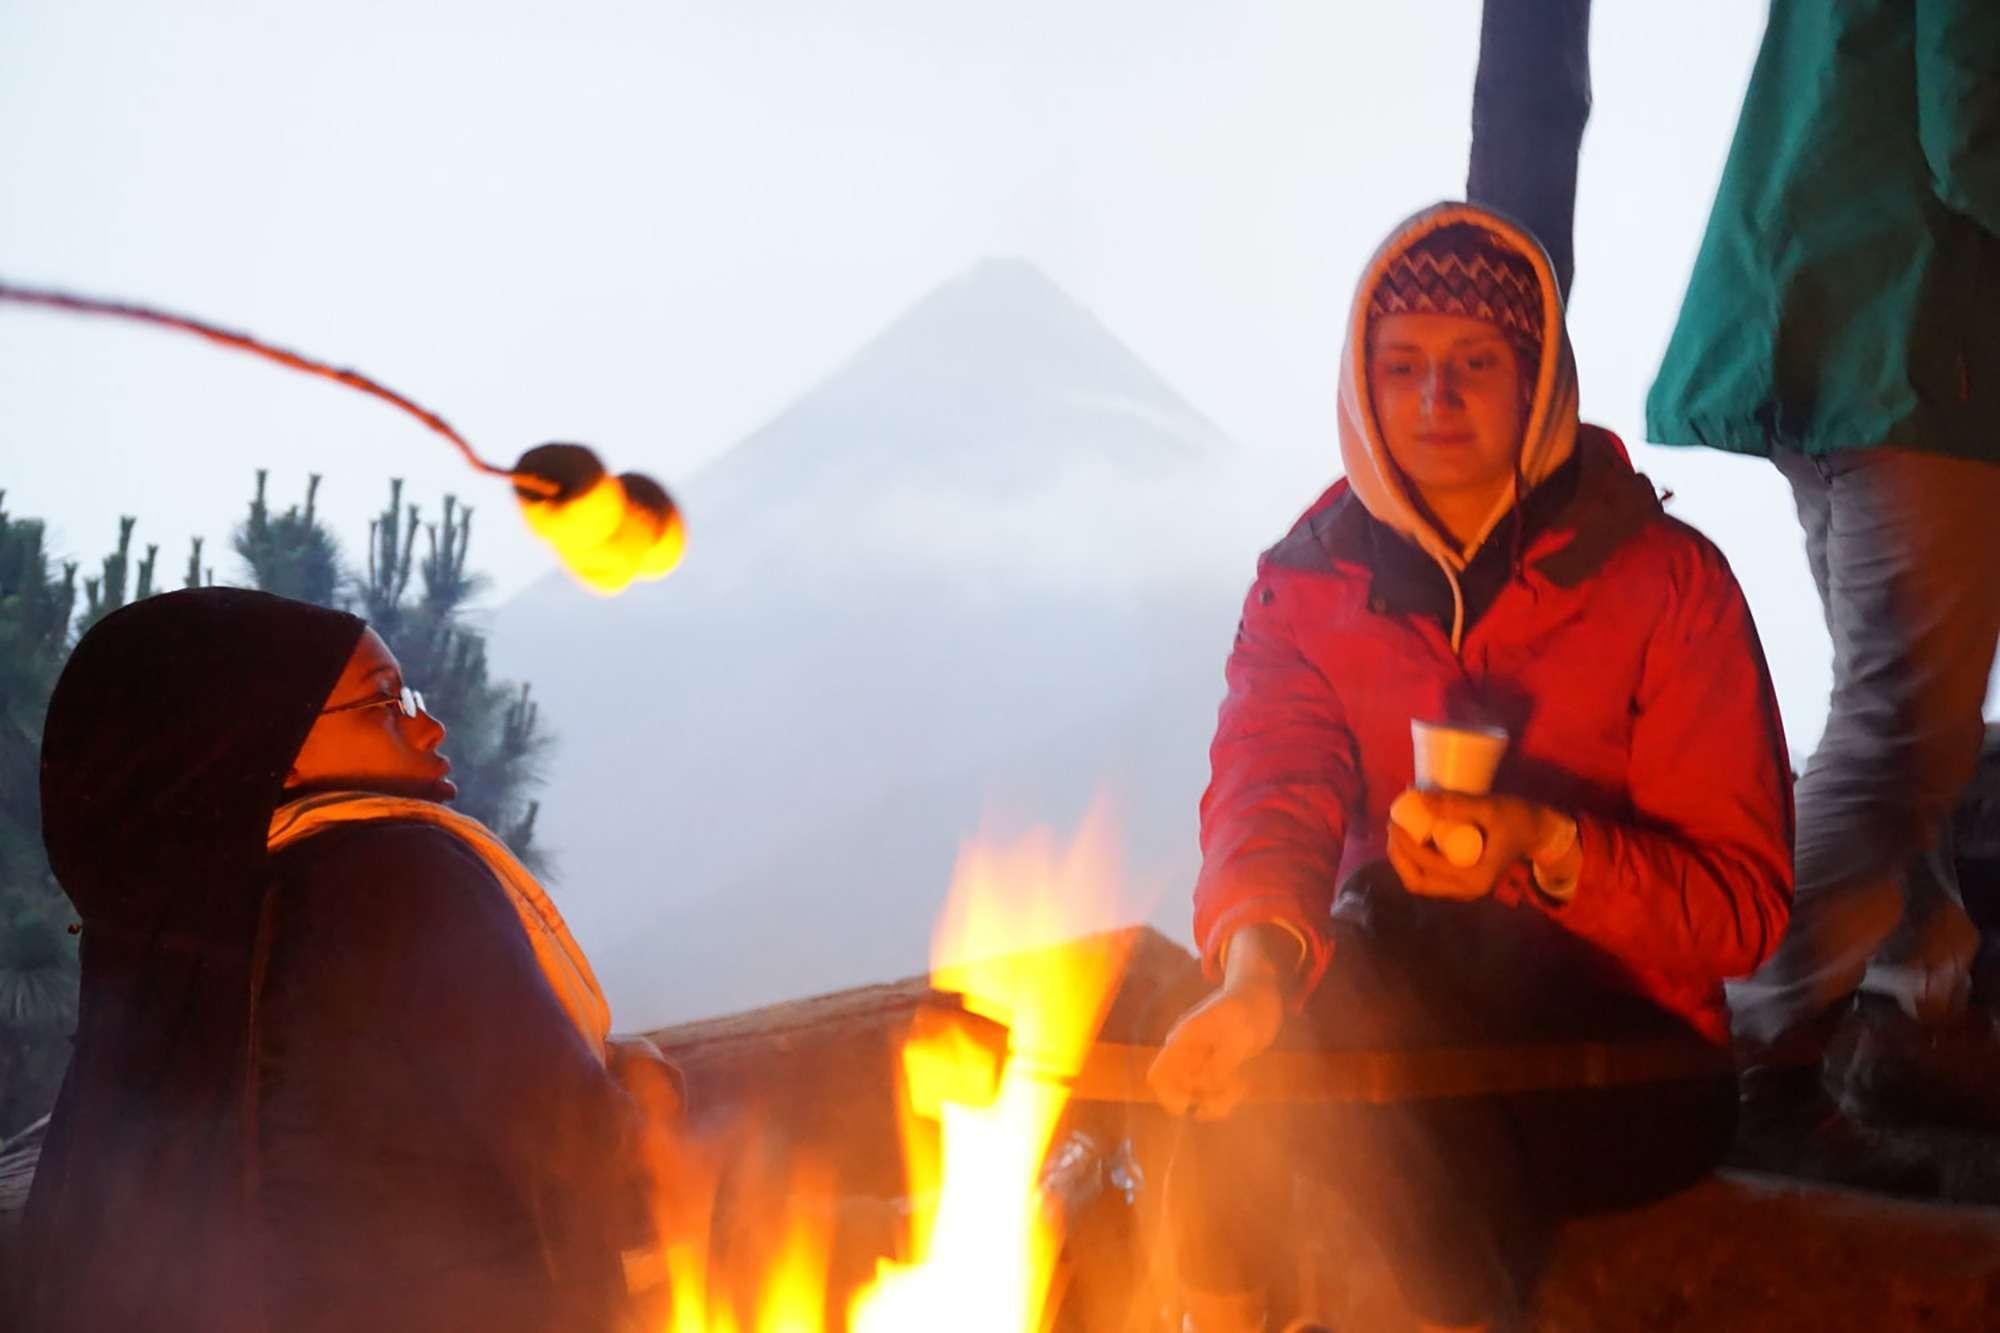 Woman roasts marshmallows at base camp during the hike up Acatenango Volcano